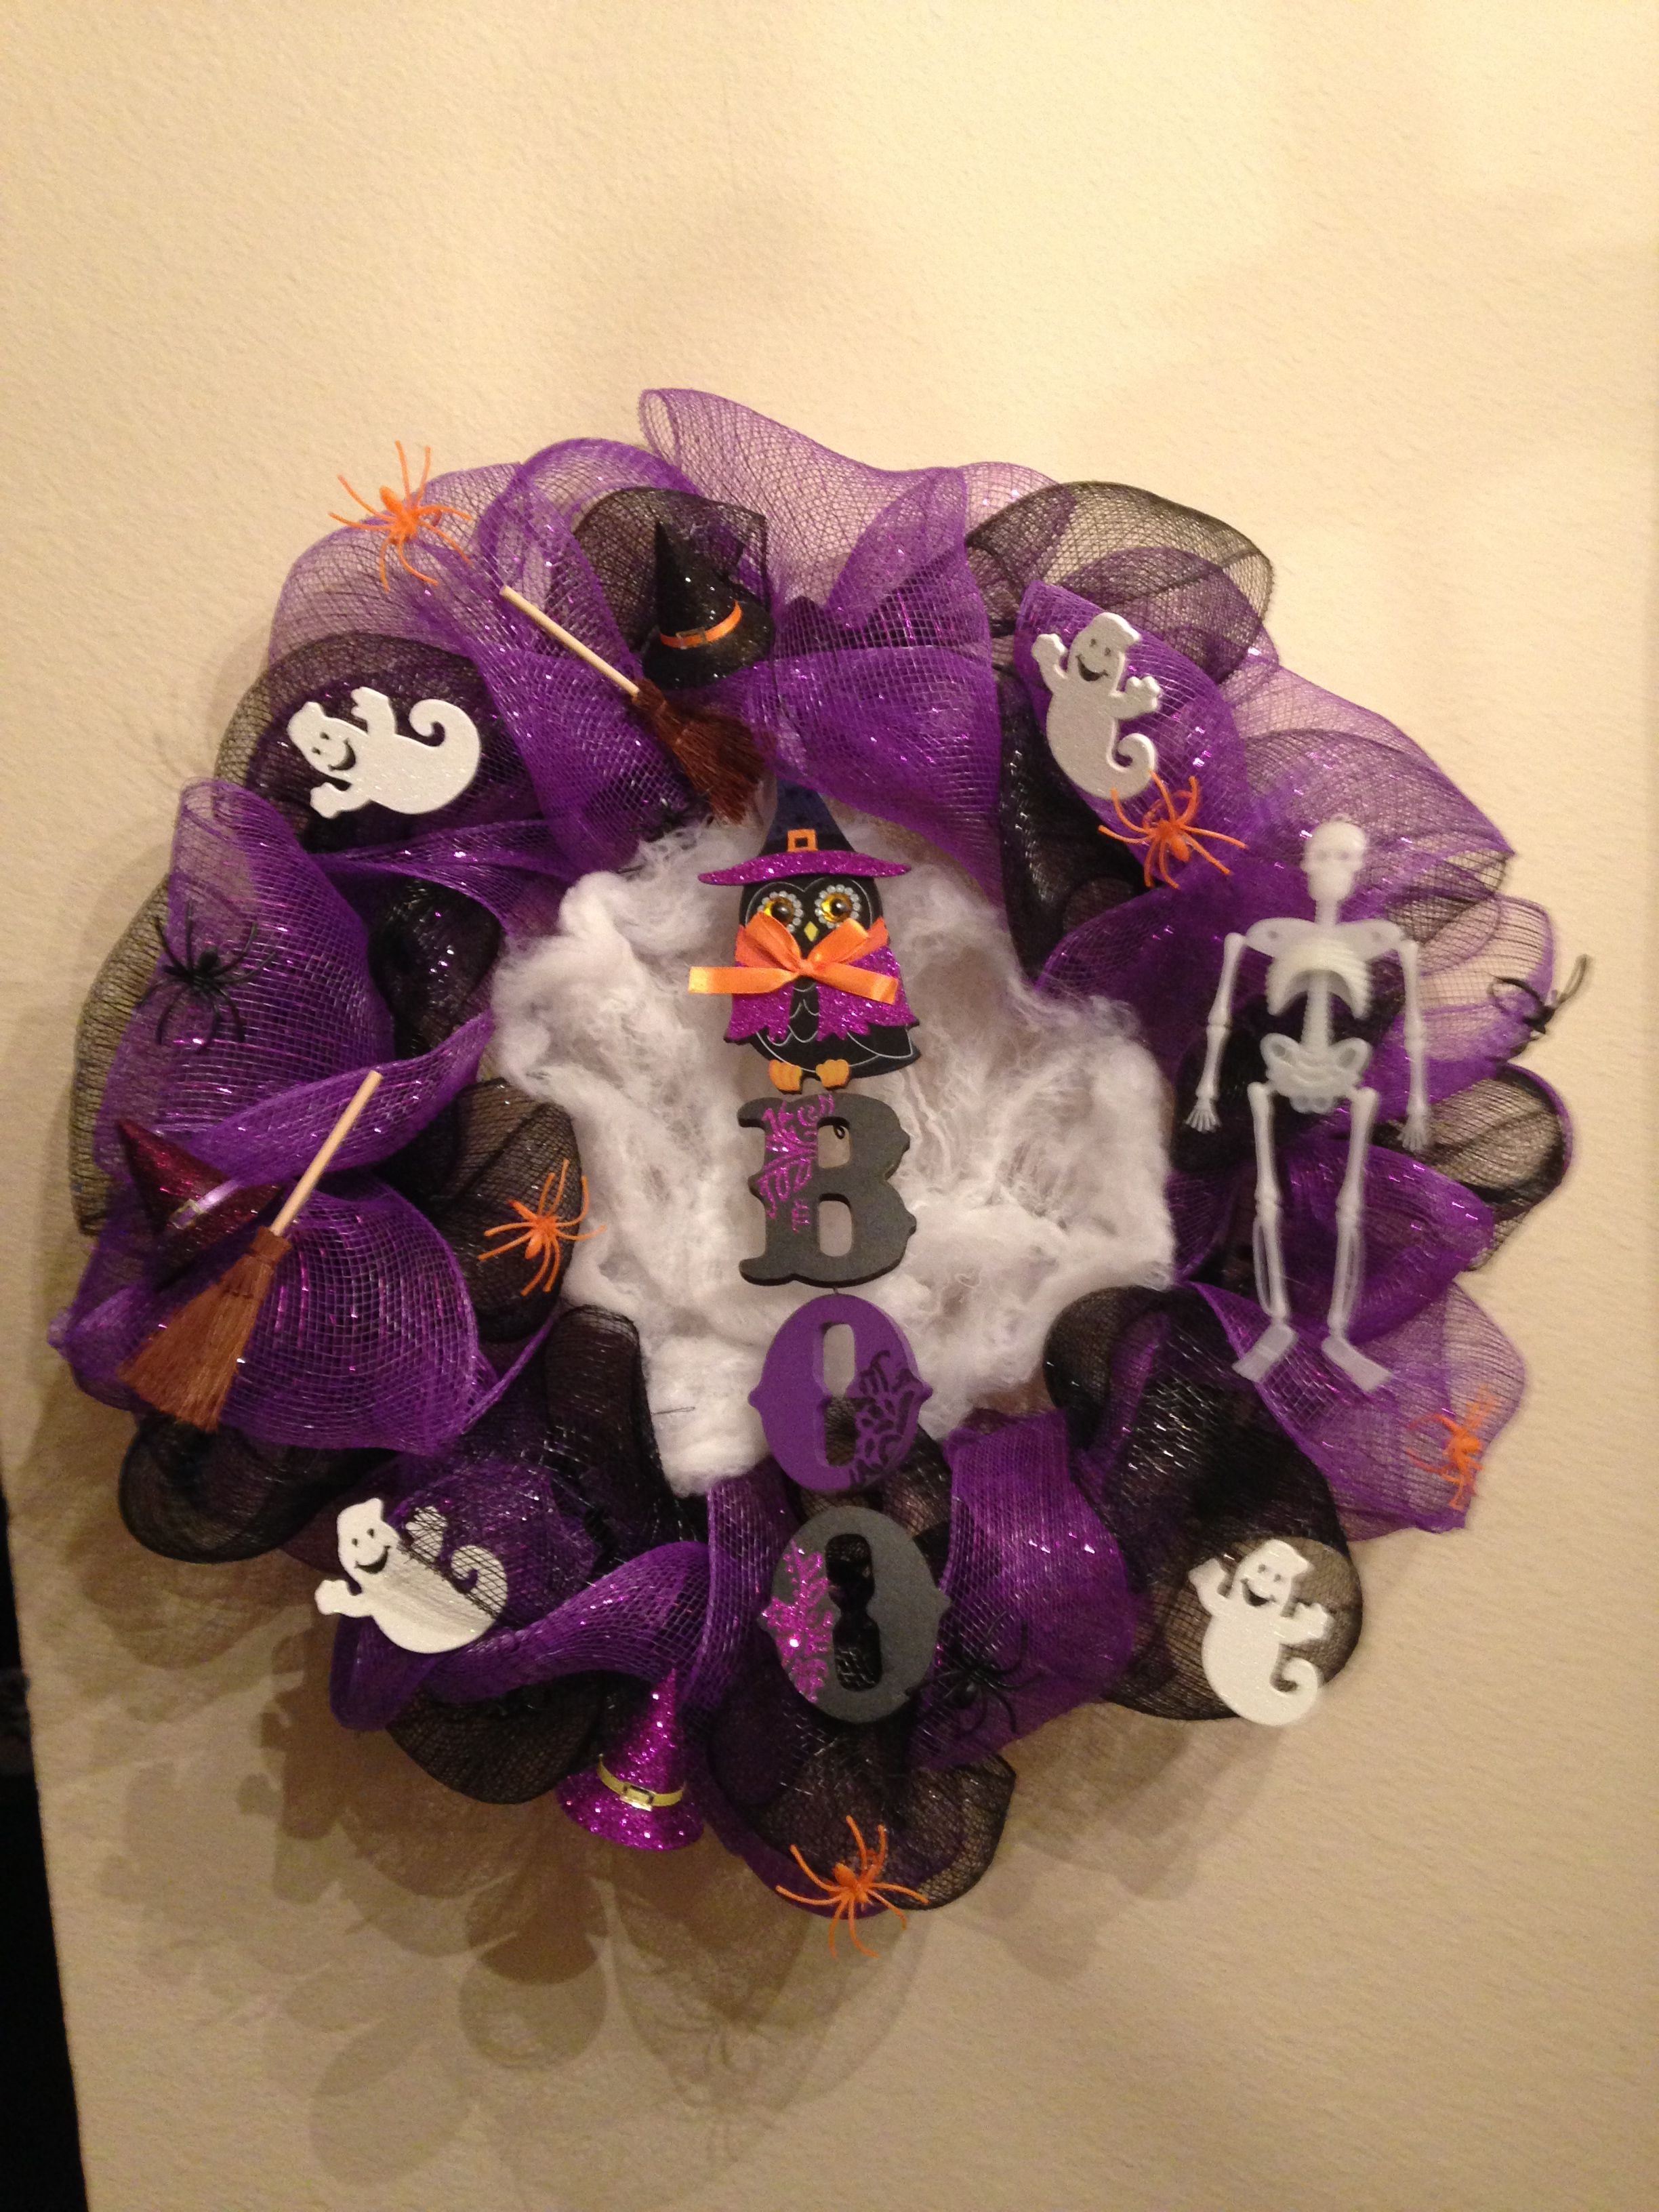 Deco mesh wreath I created!